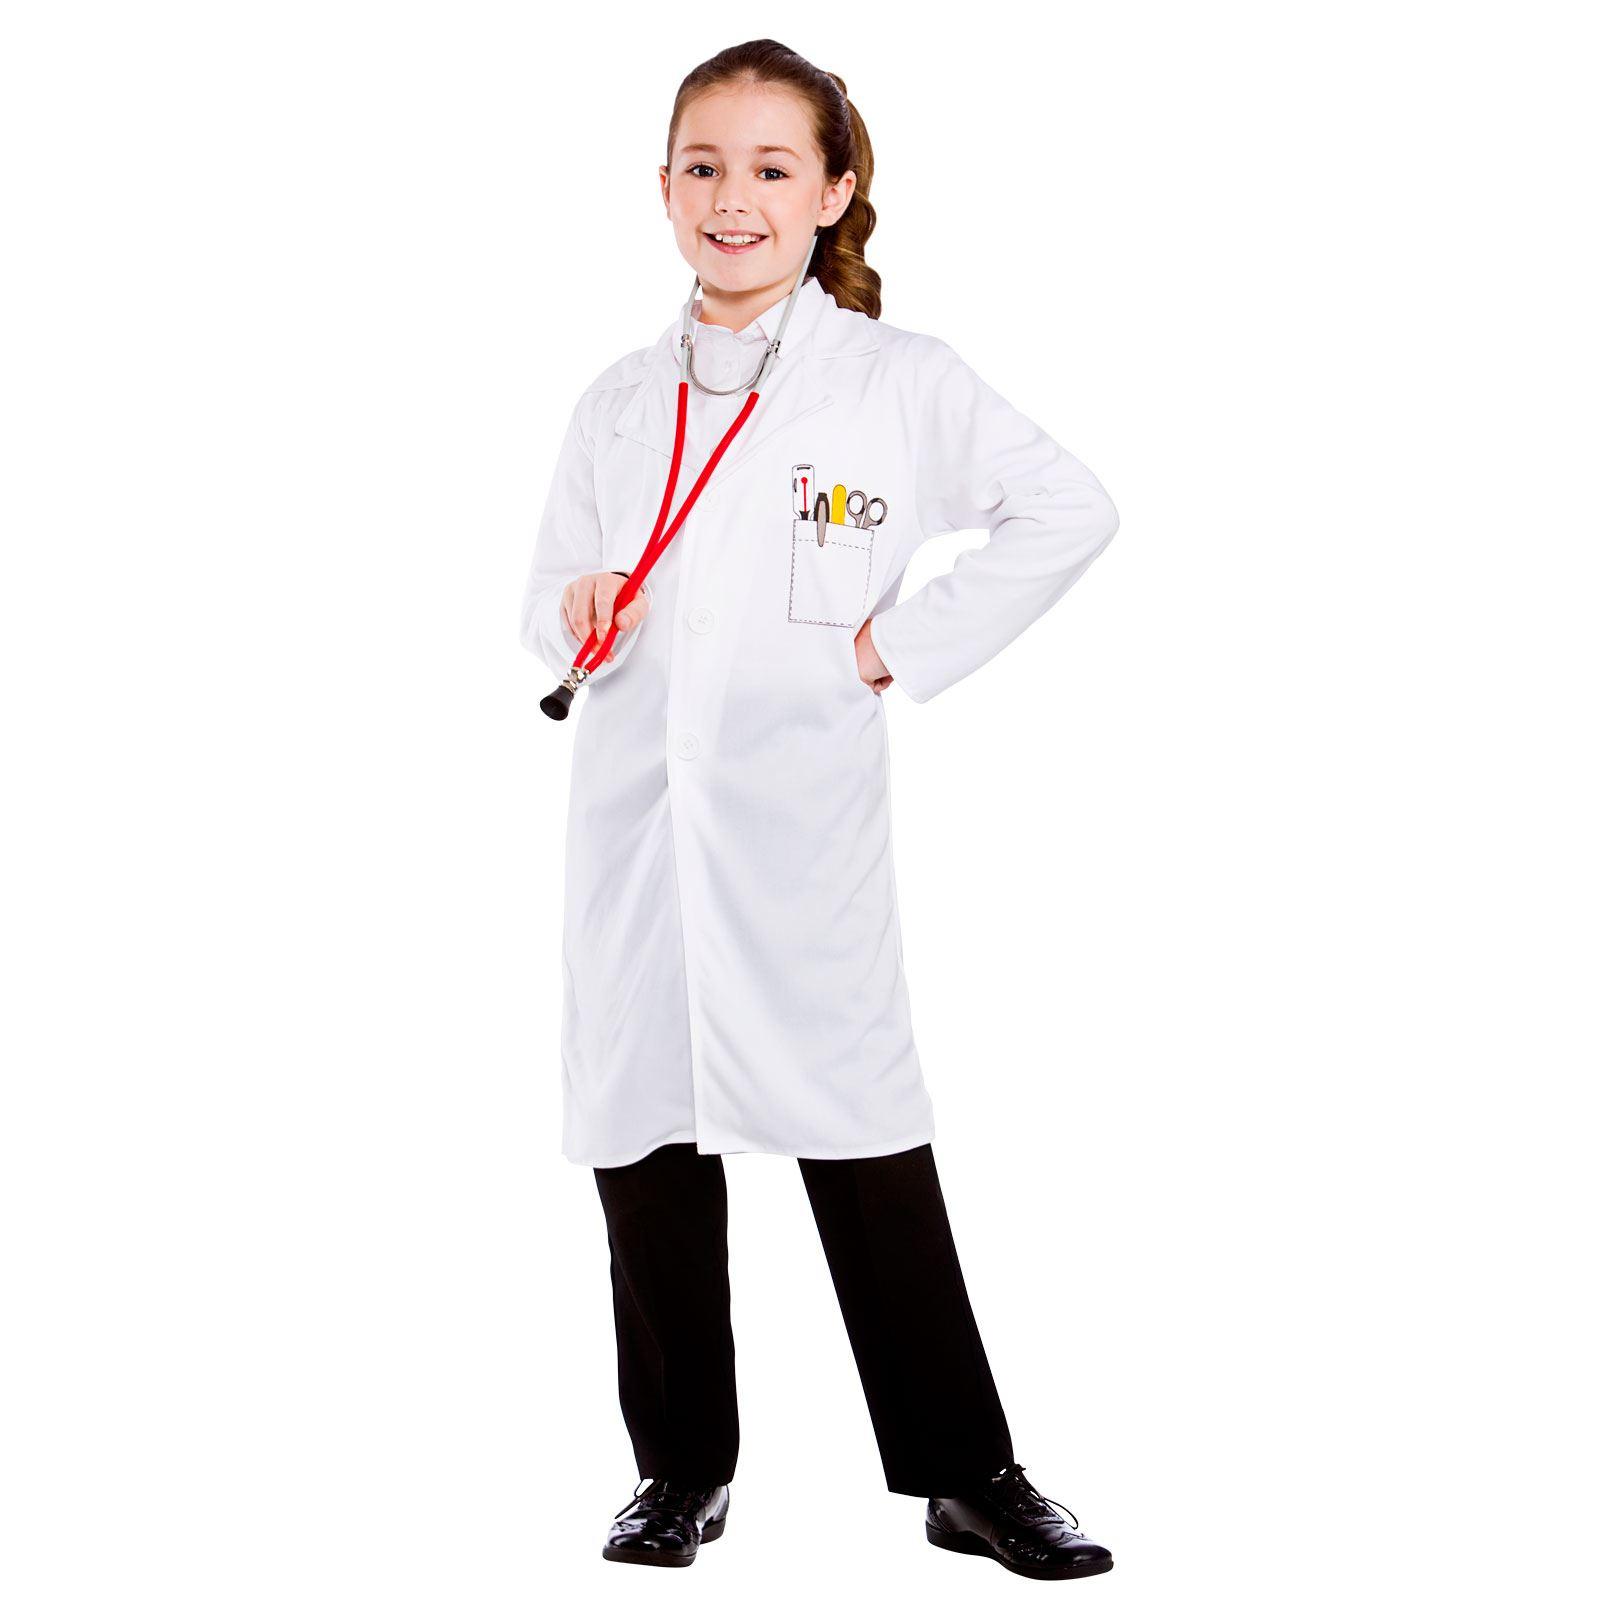 26c71d85d19db Childrens Unisex White Doctors Coat Fancy Dress Up Party Costume Outfit New